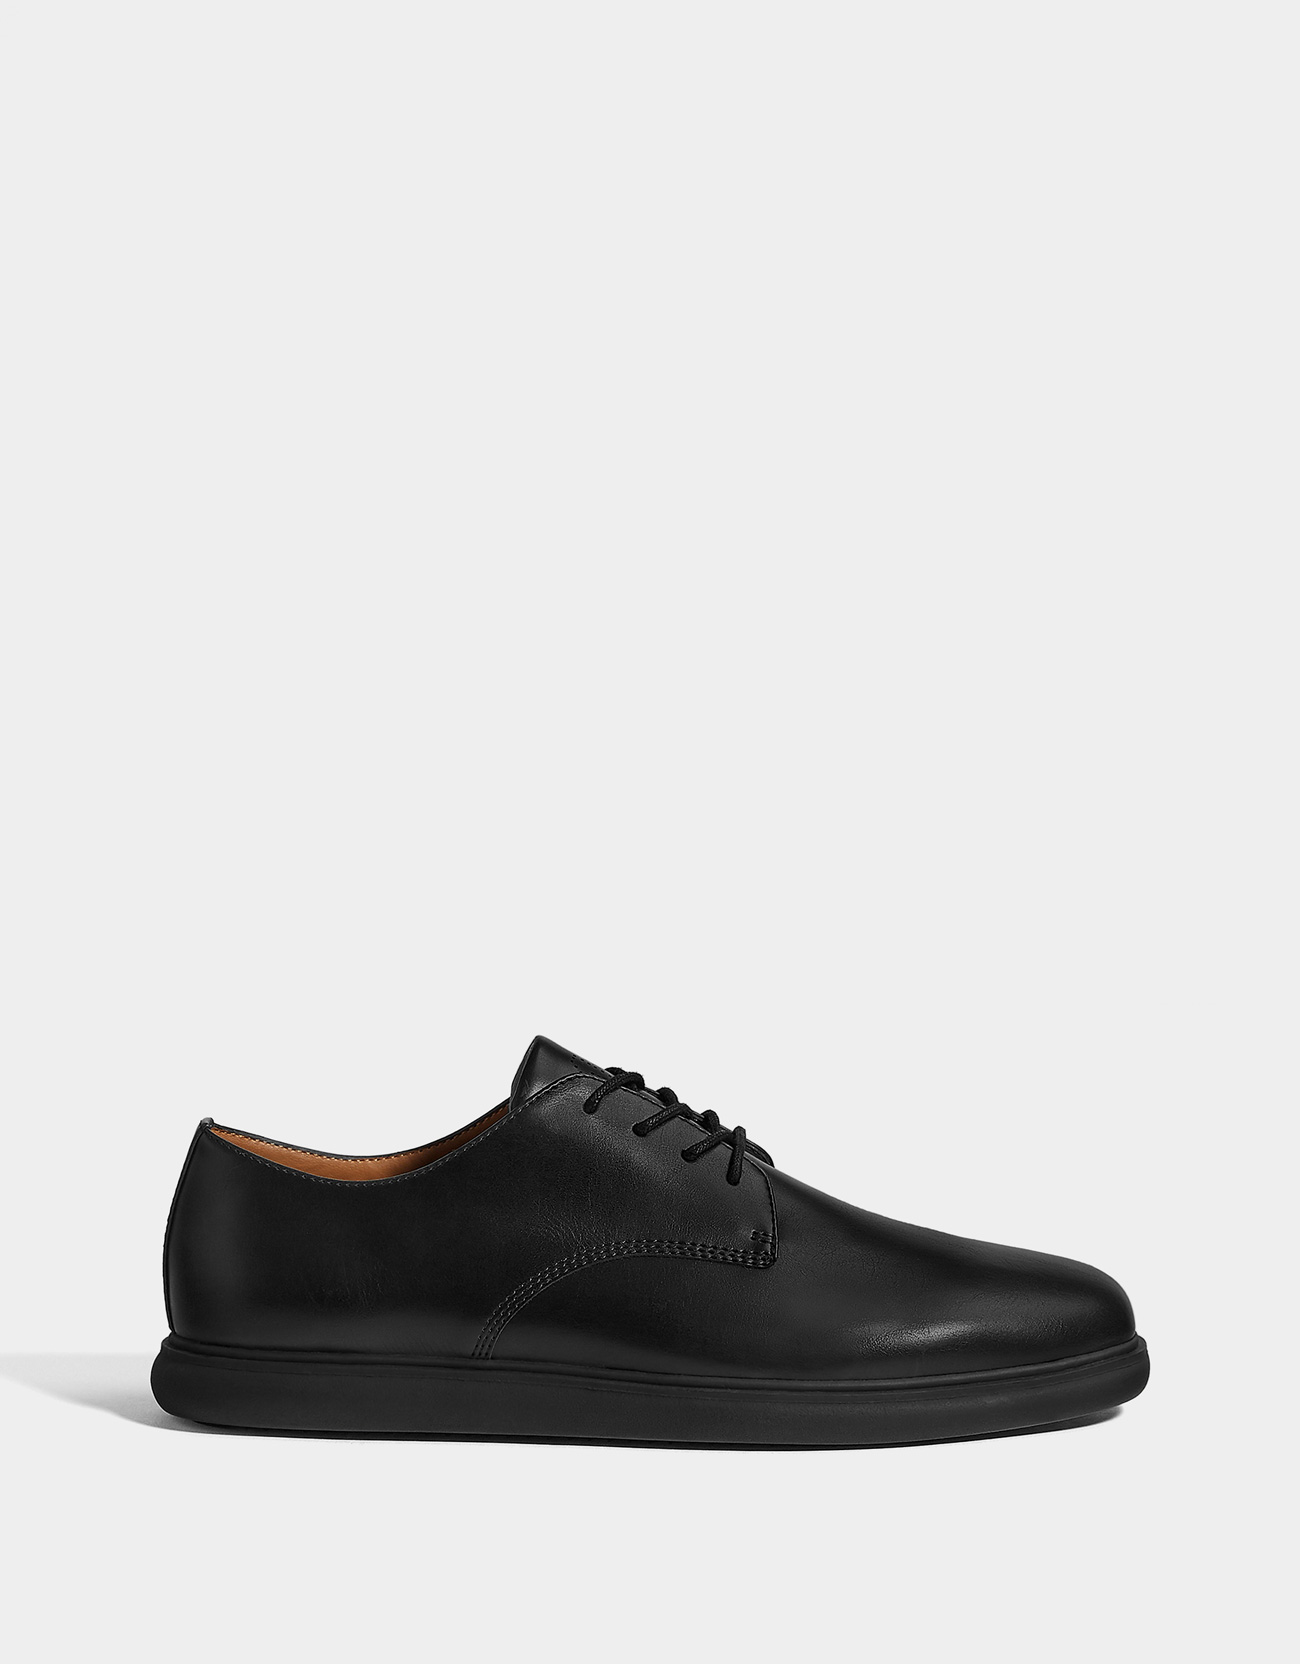 Chaussures habillées homme